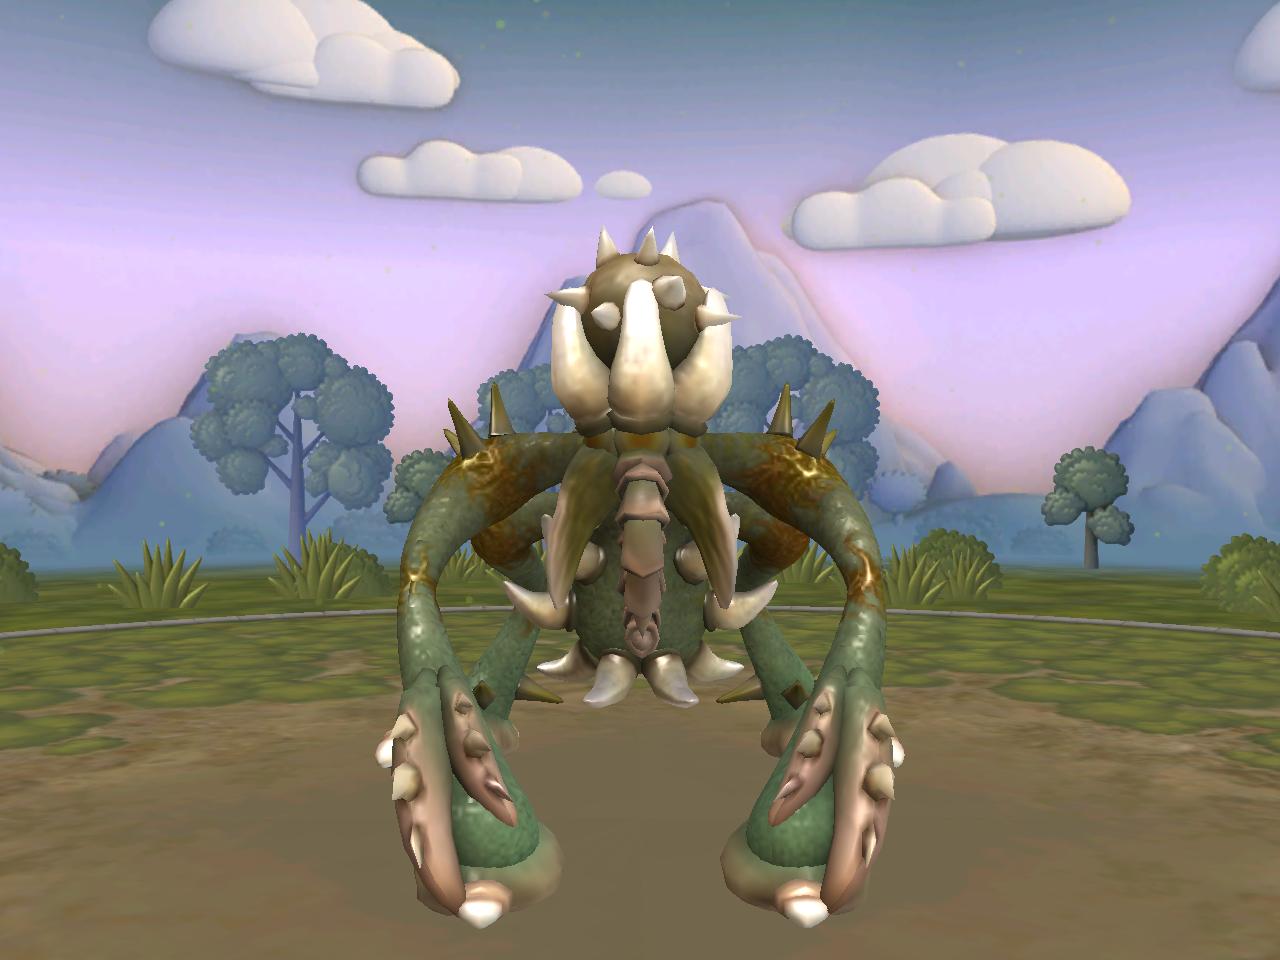 Gurowm, Insecto Puntiagudo CRE-Gurowm-1ba8ba61-ful